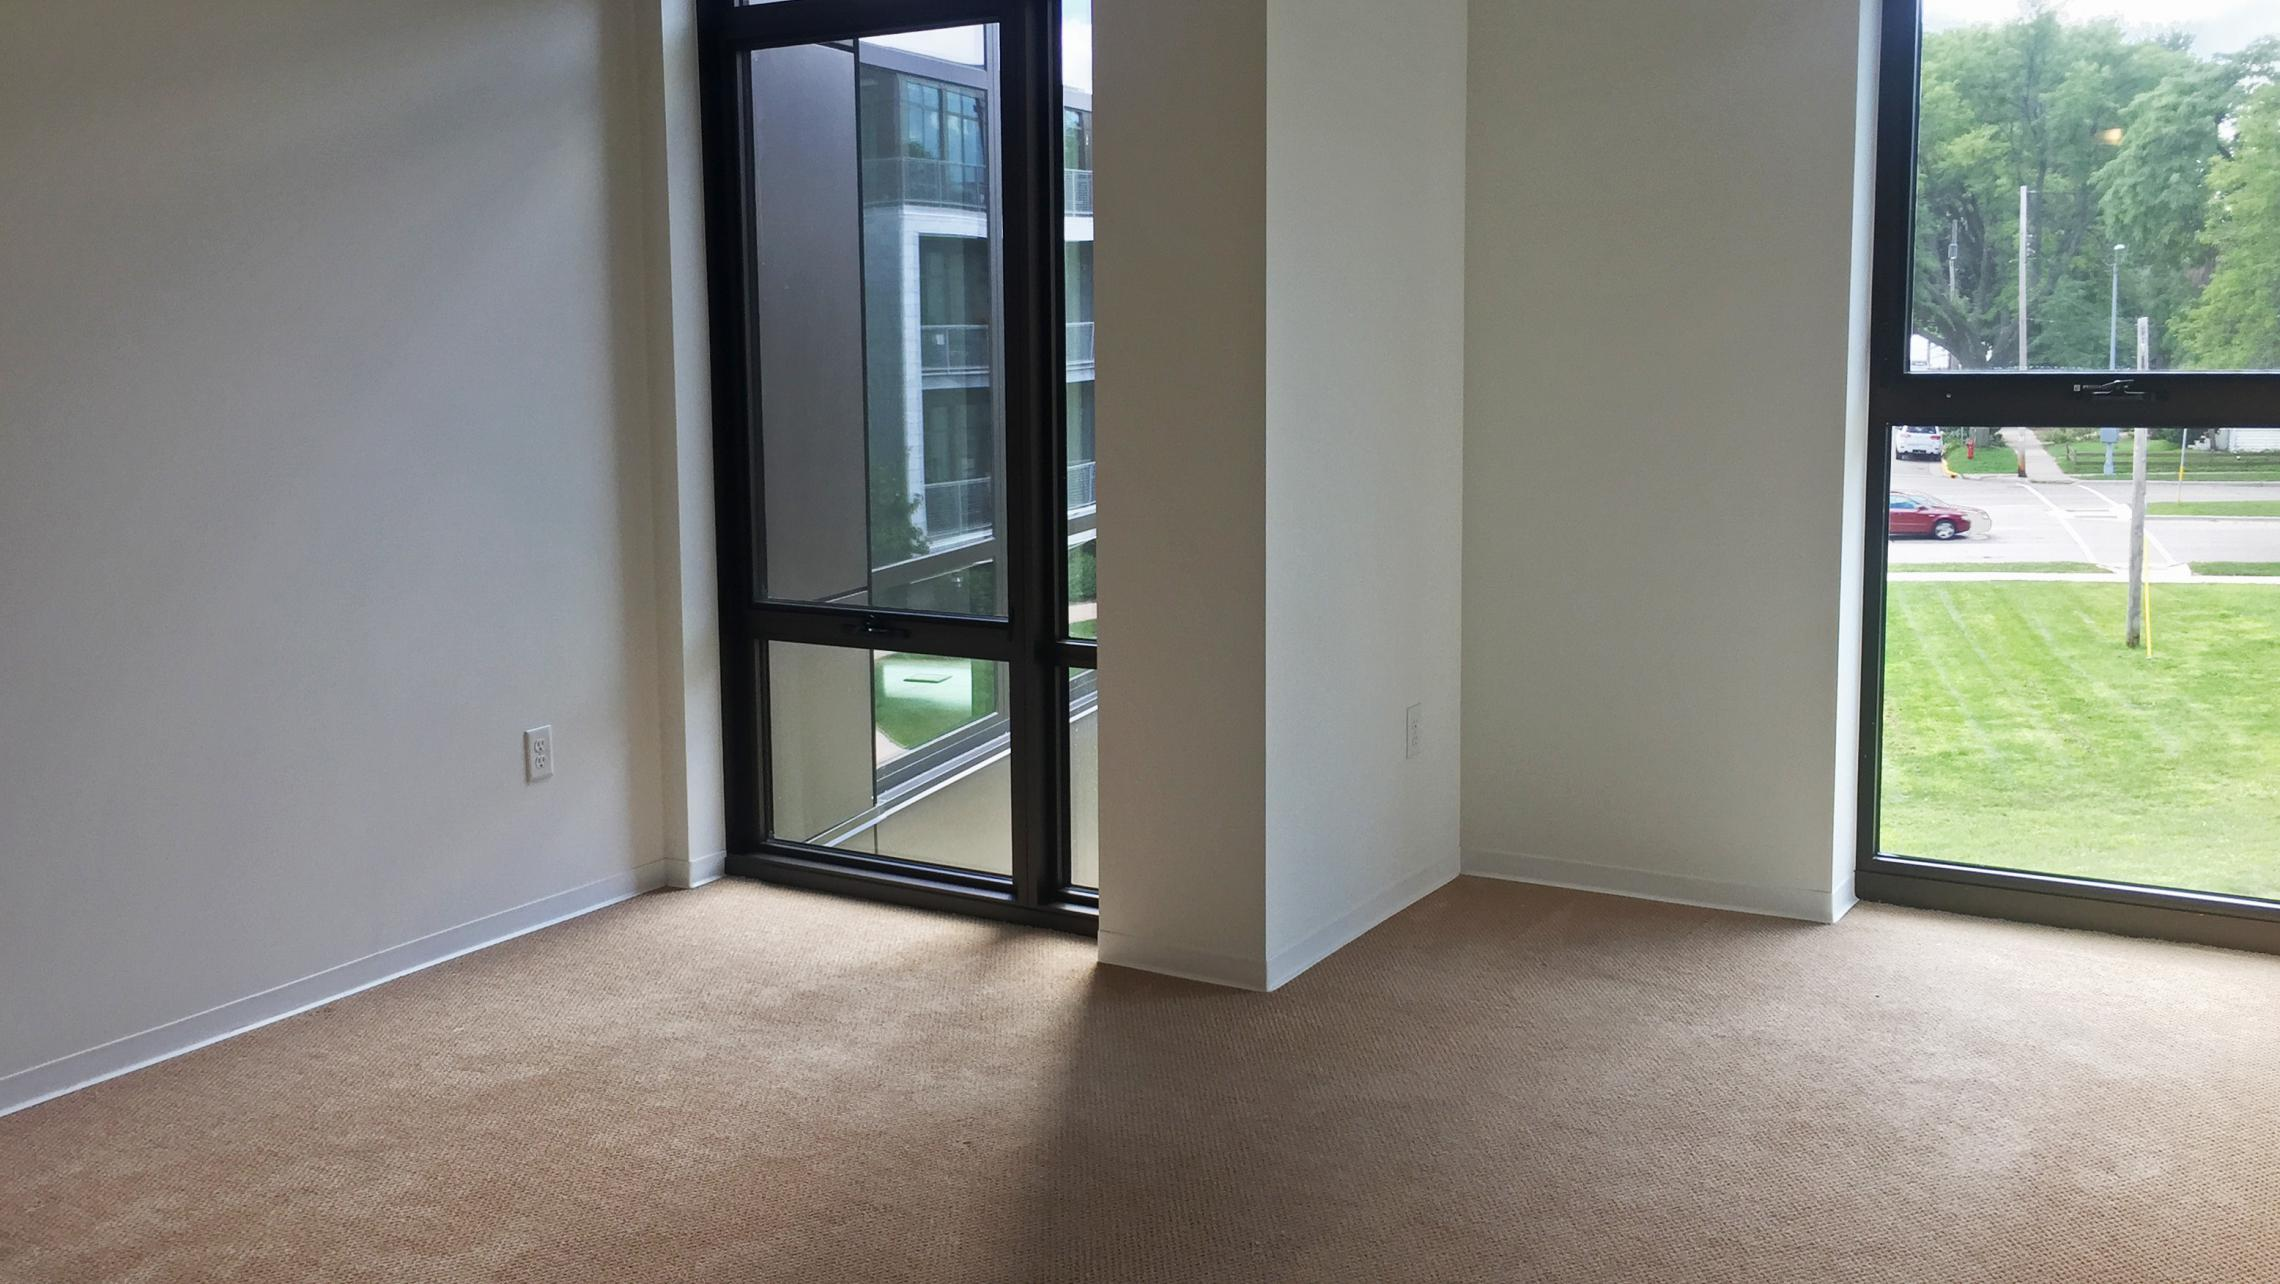 ULI Seven27 Apartment 237 - Living Area Window